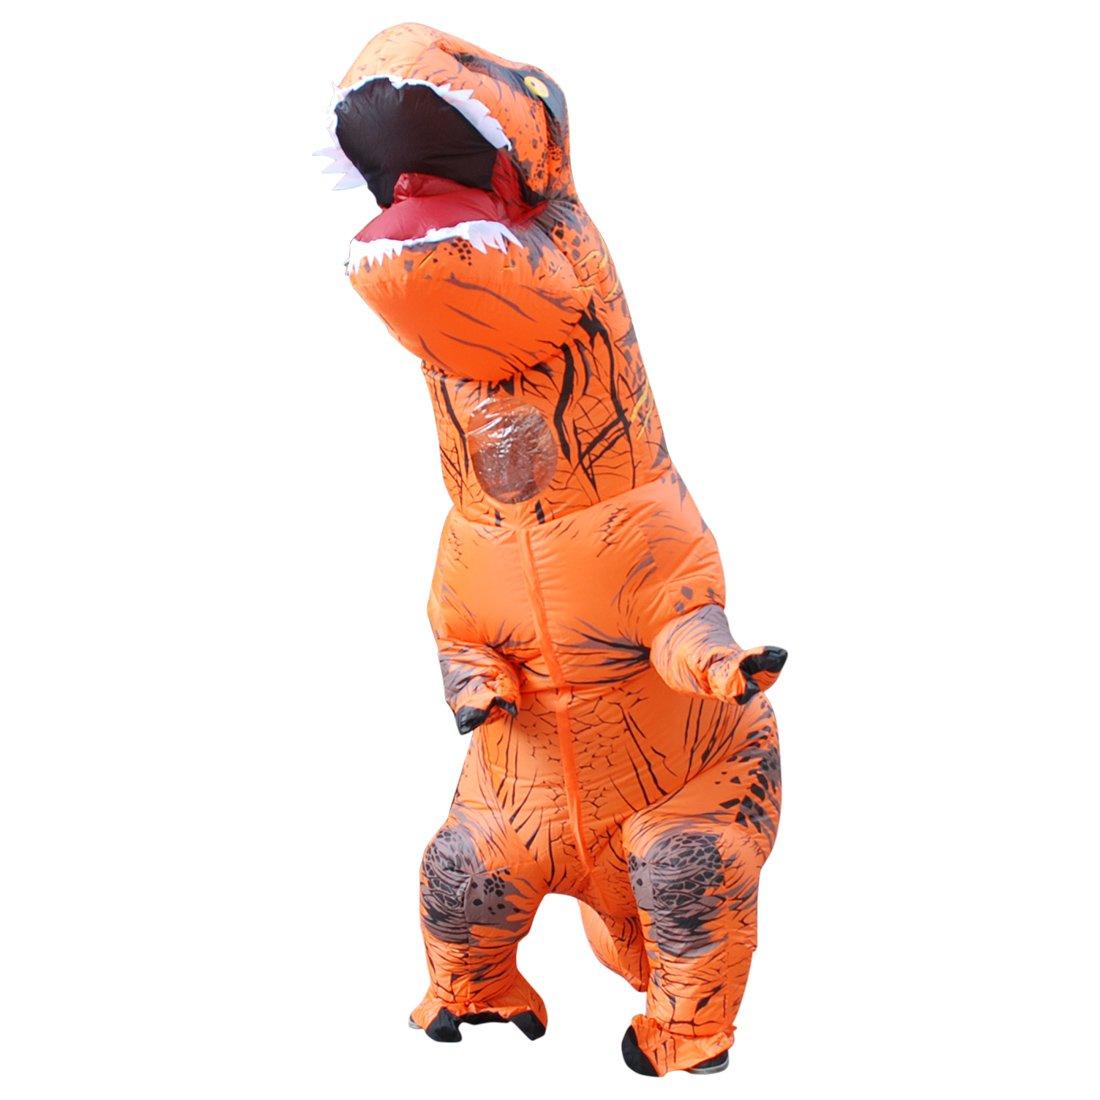 DUBAOBAO Kostüm Aufblasbares Dinosaurierkostüm Halloween-Ereignis, Aufblasbares Dinosaurierkostüm Halloweens, Aufblasbares Tyrannosauruskostüm, Orange